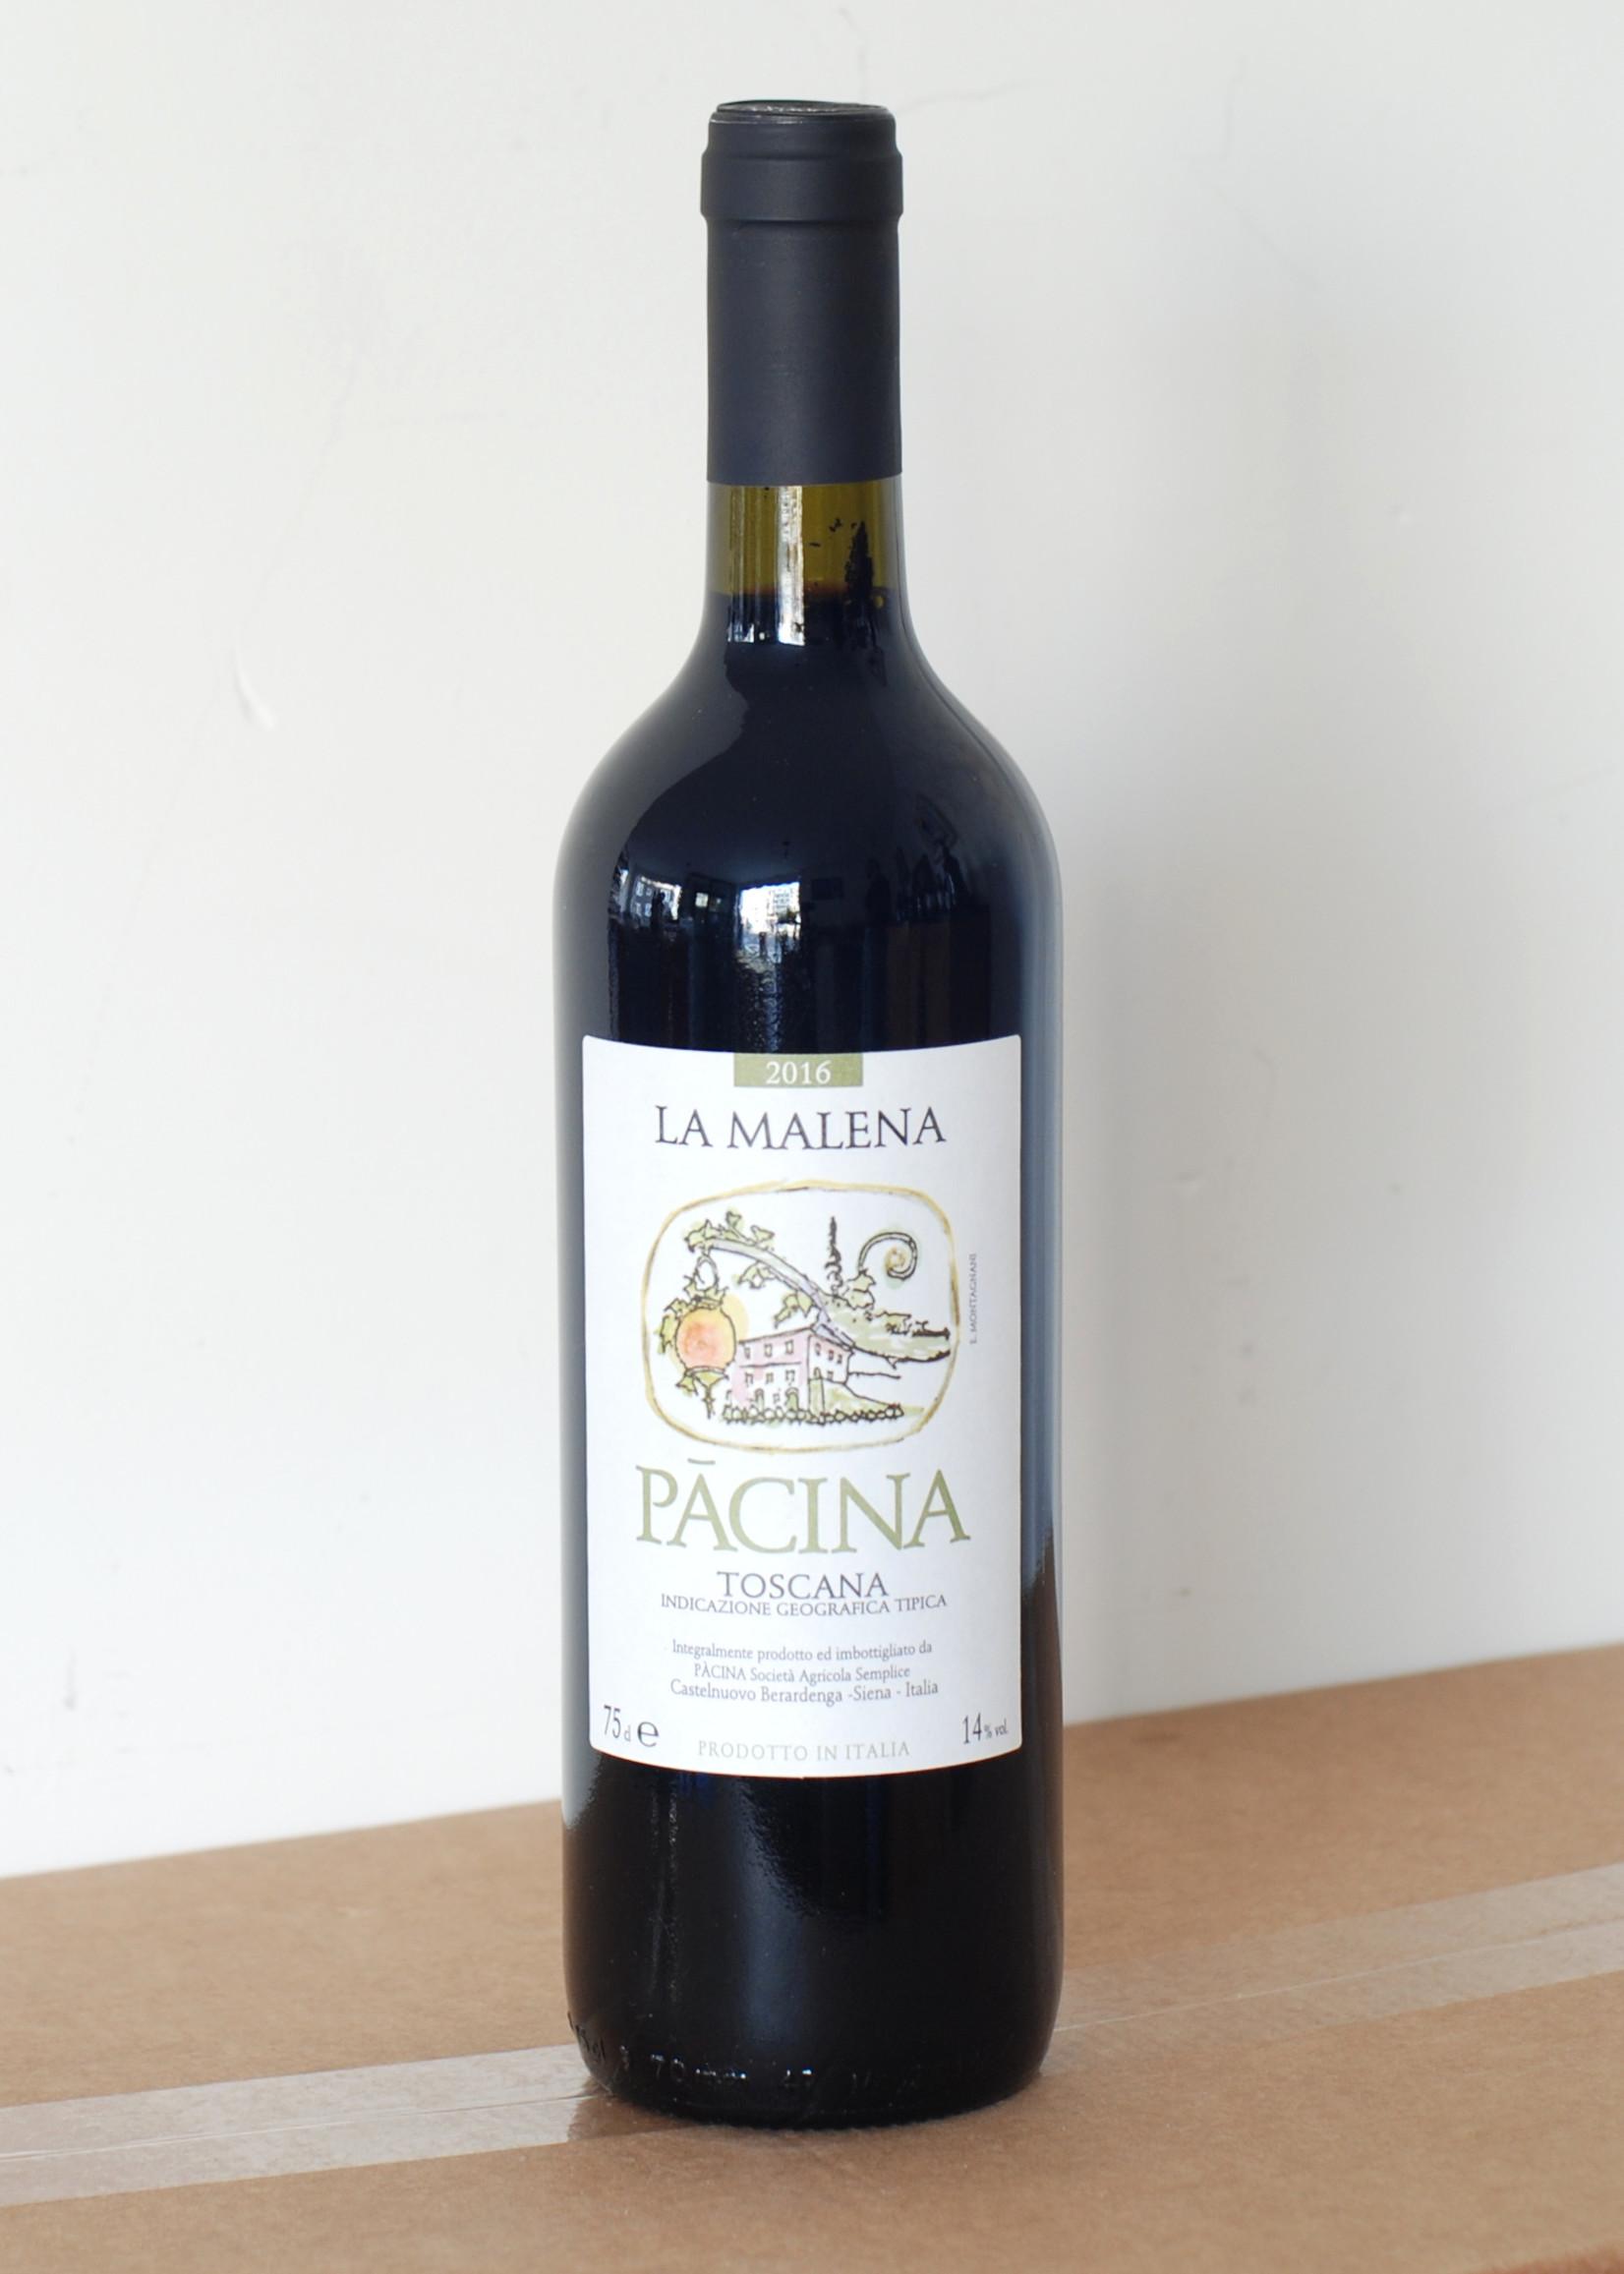 Pacina Pacina - La Malena 2016